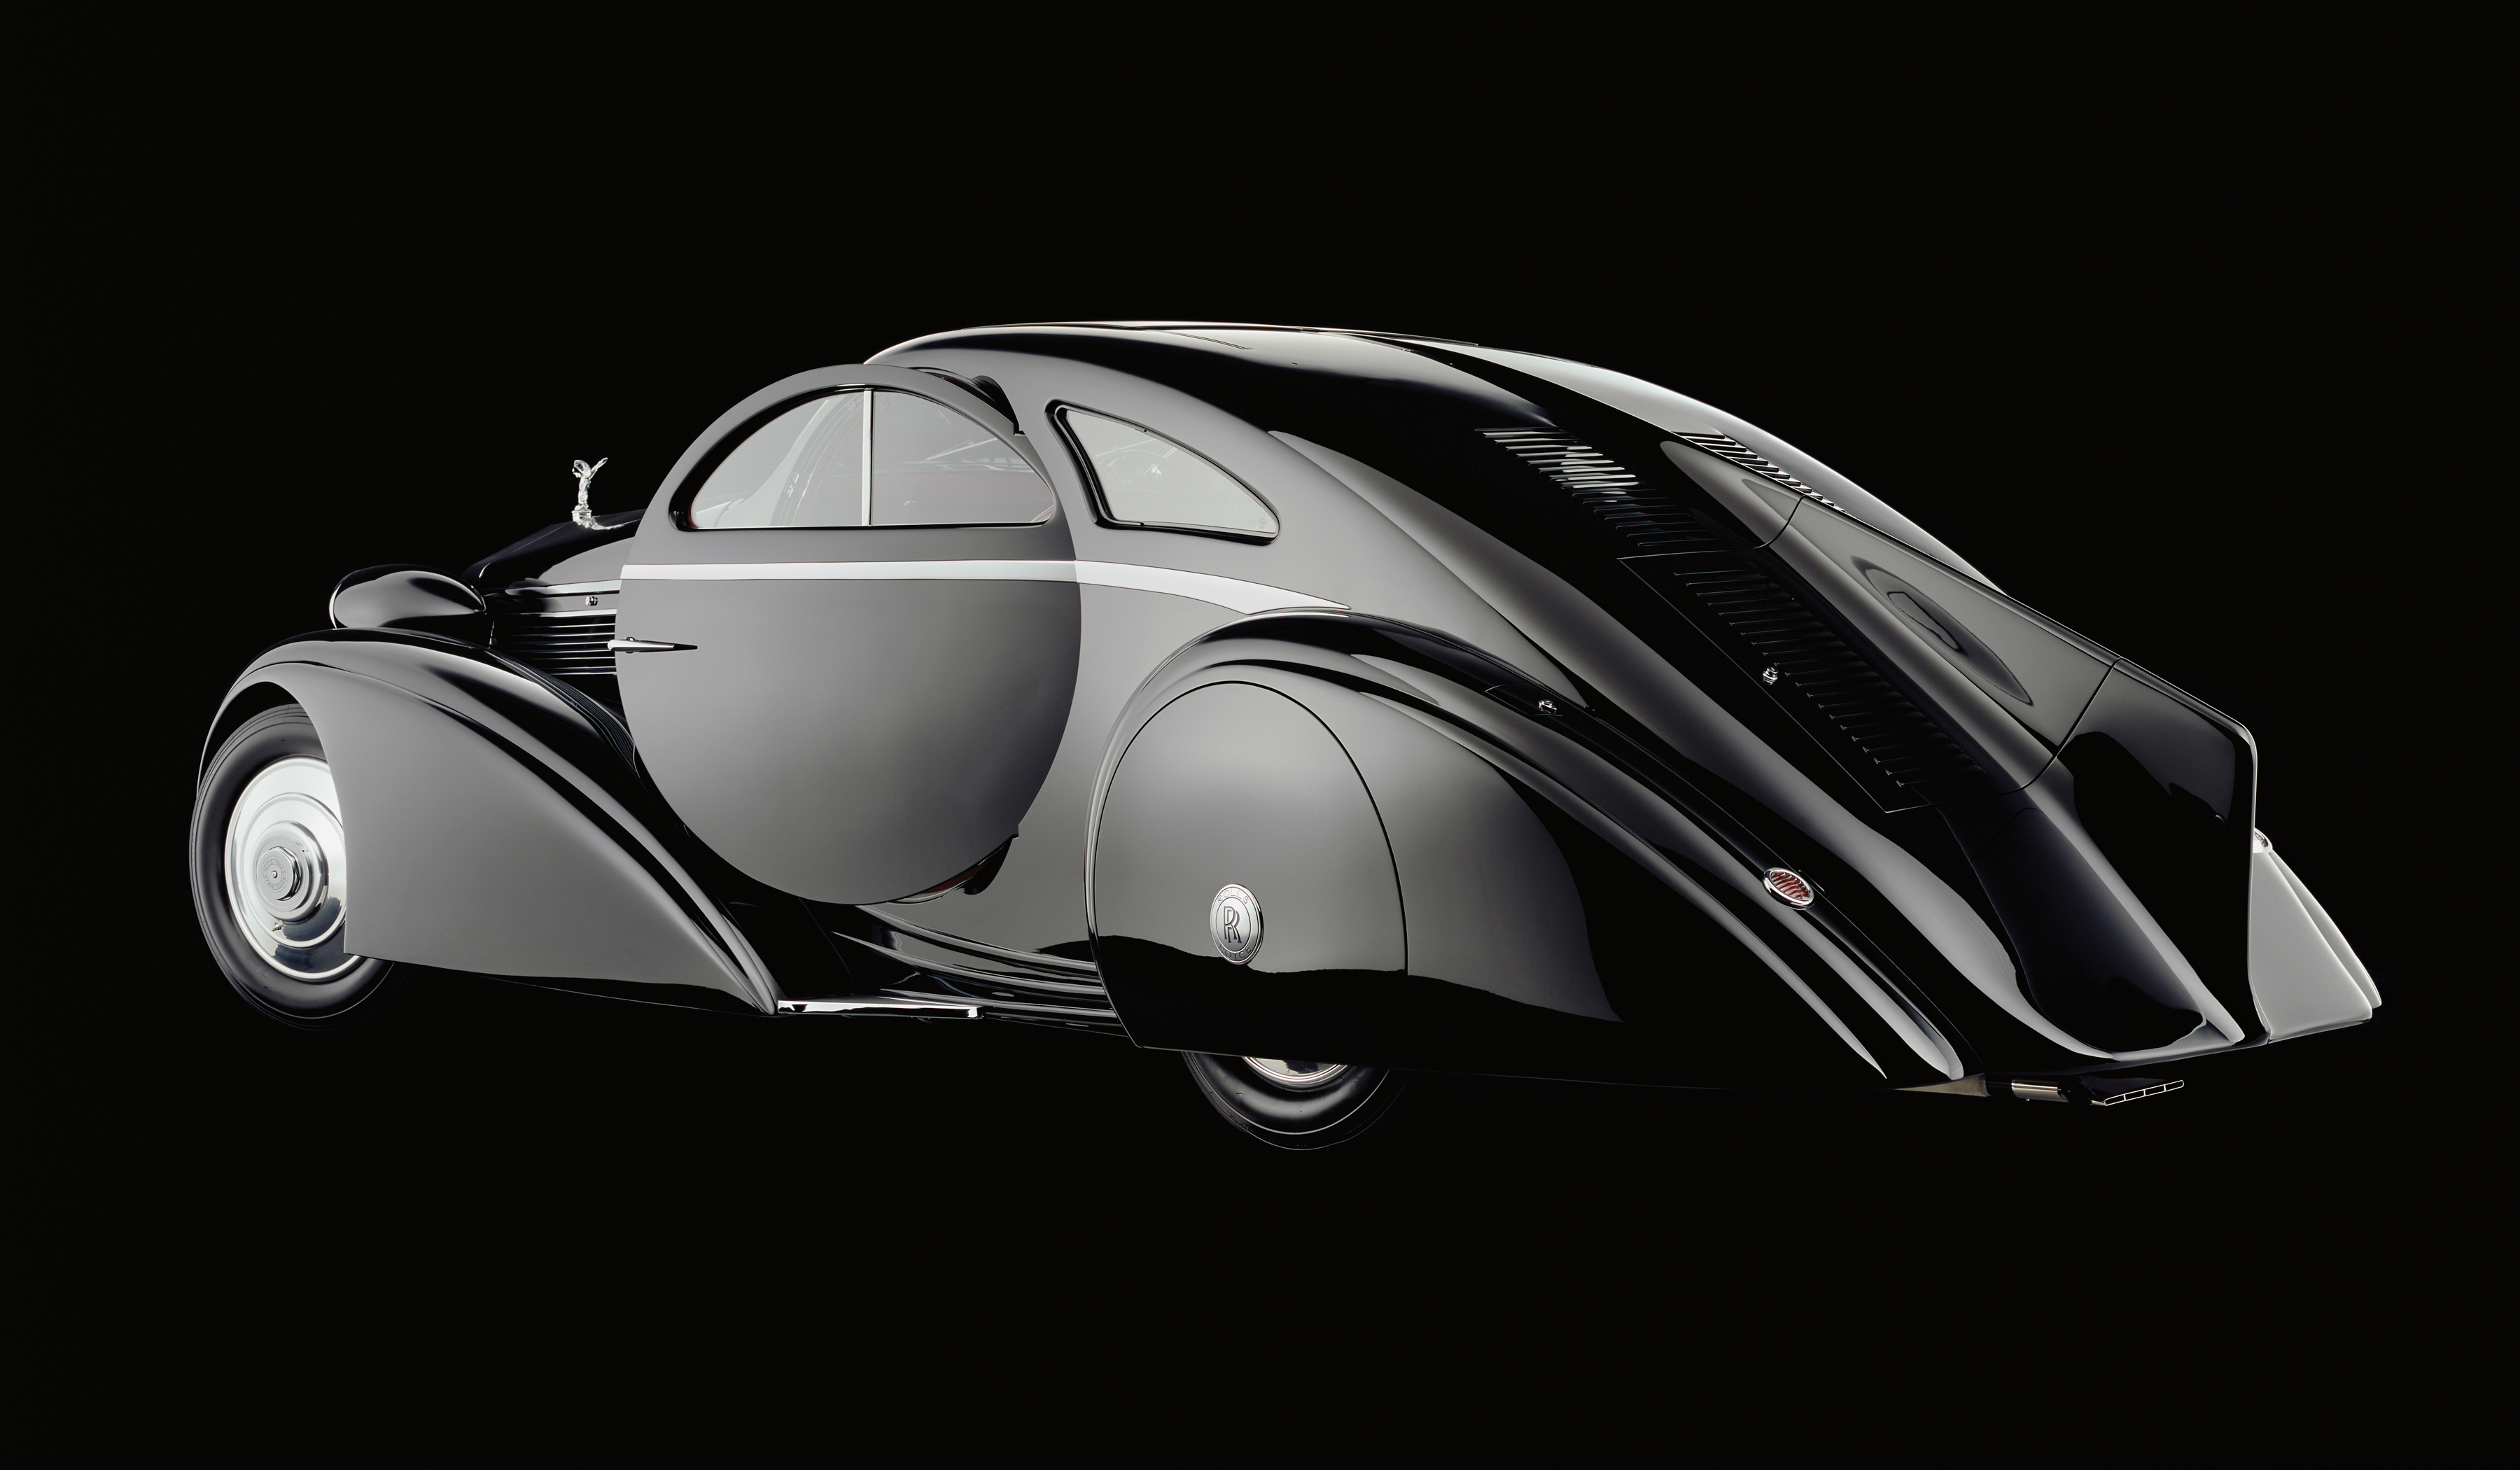 HD Quality Wallpaper | Collection: Vehicles, 3600x2100 1925 Rolls-royce Phantom